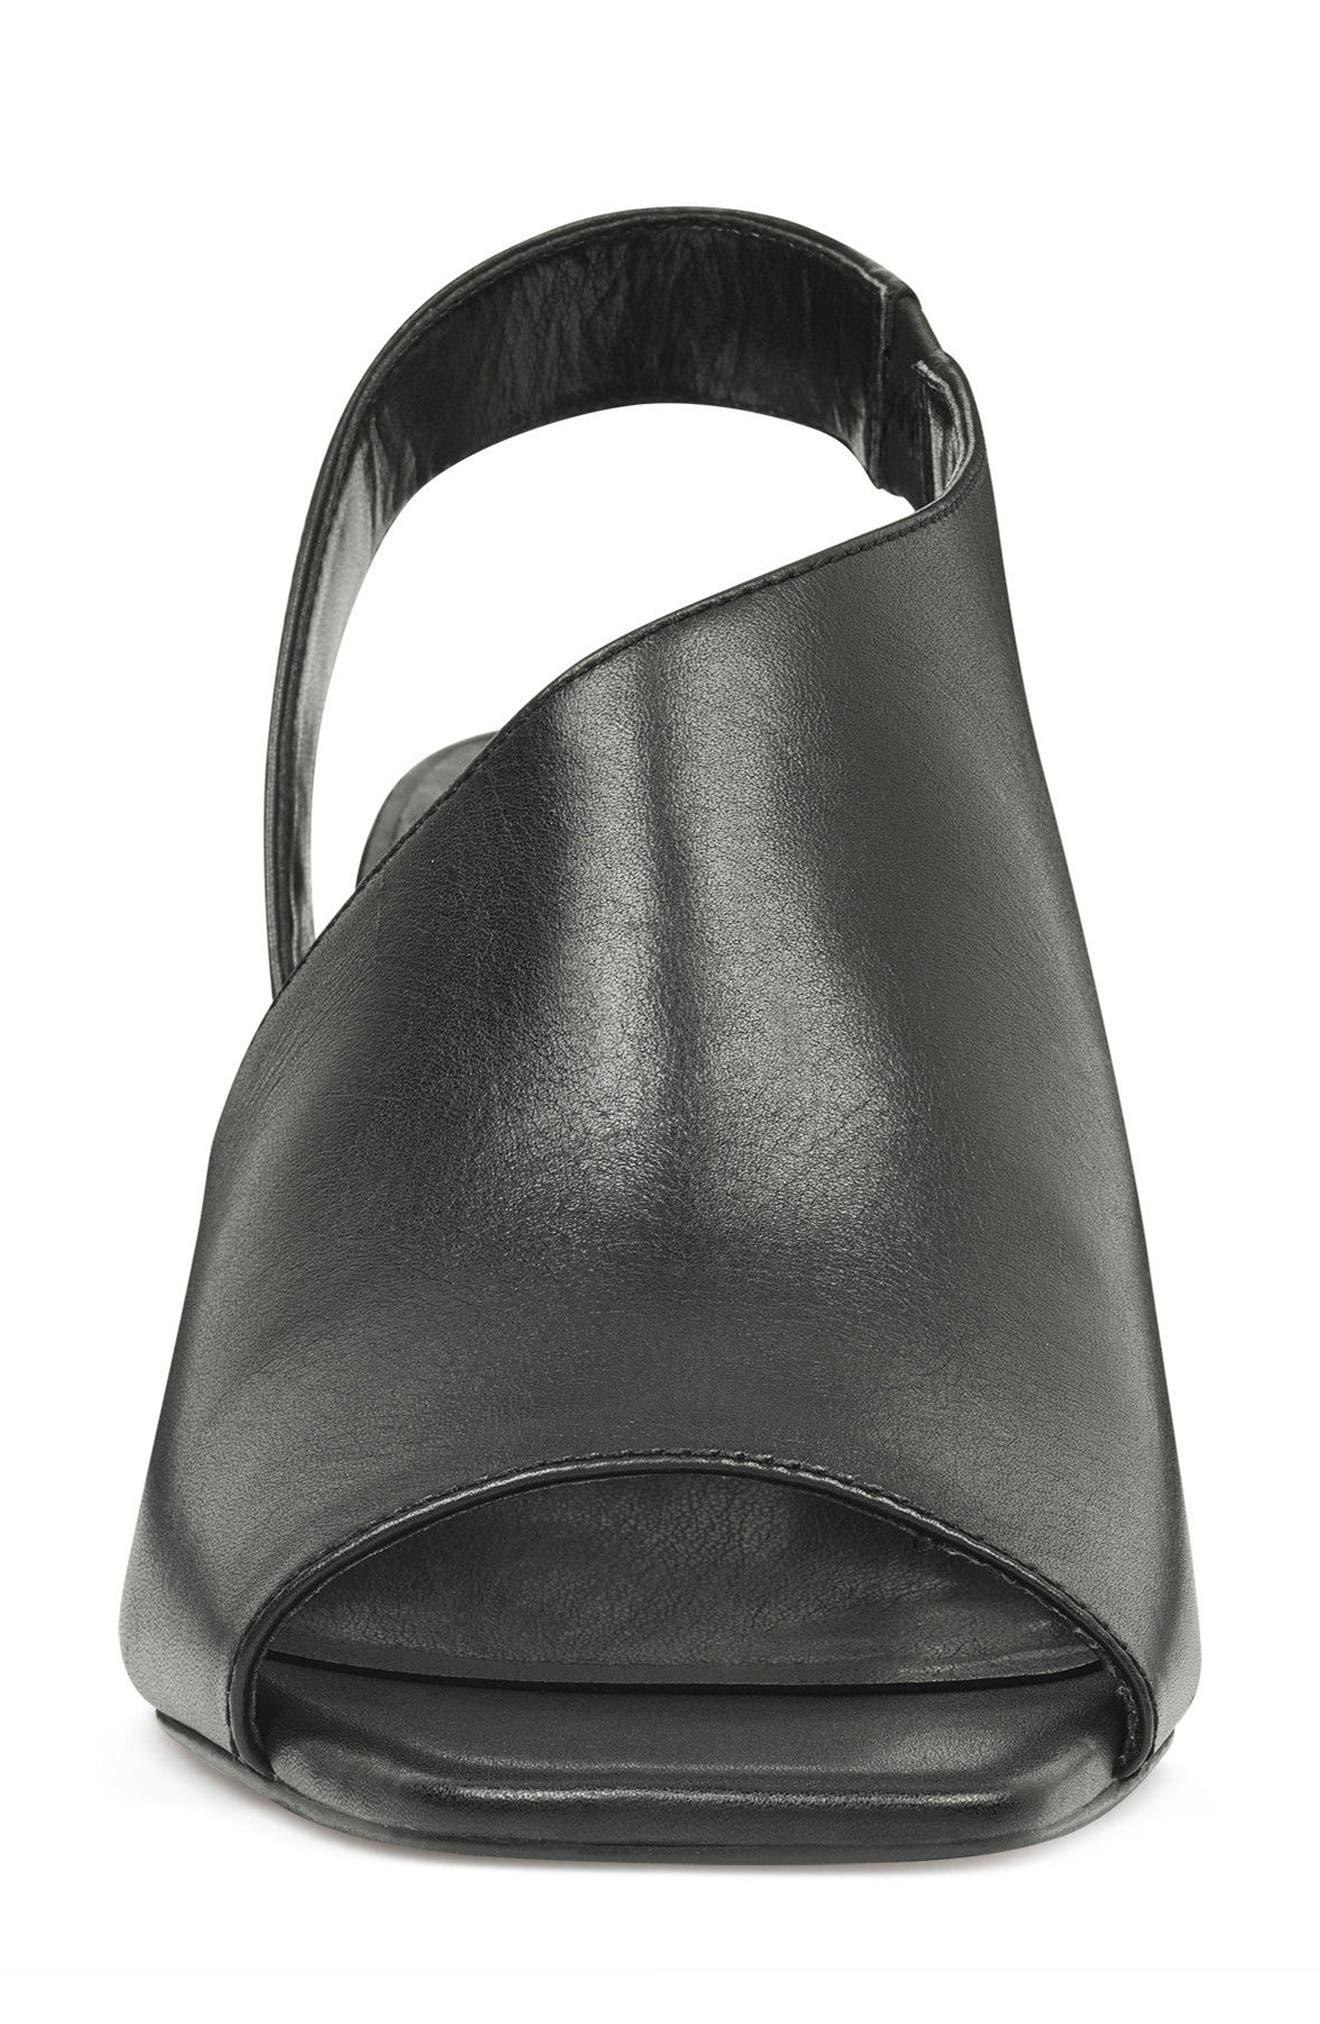 Orrus Asymmetrical Sandal,                             Alternate thumbnail 4, color,                             001